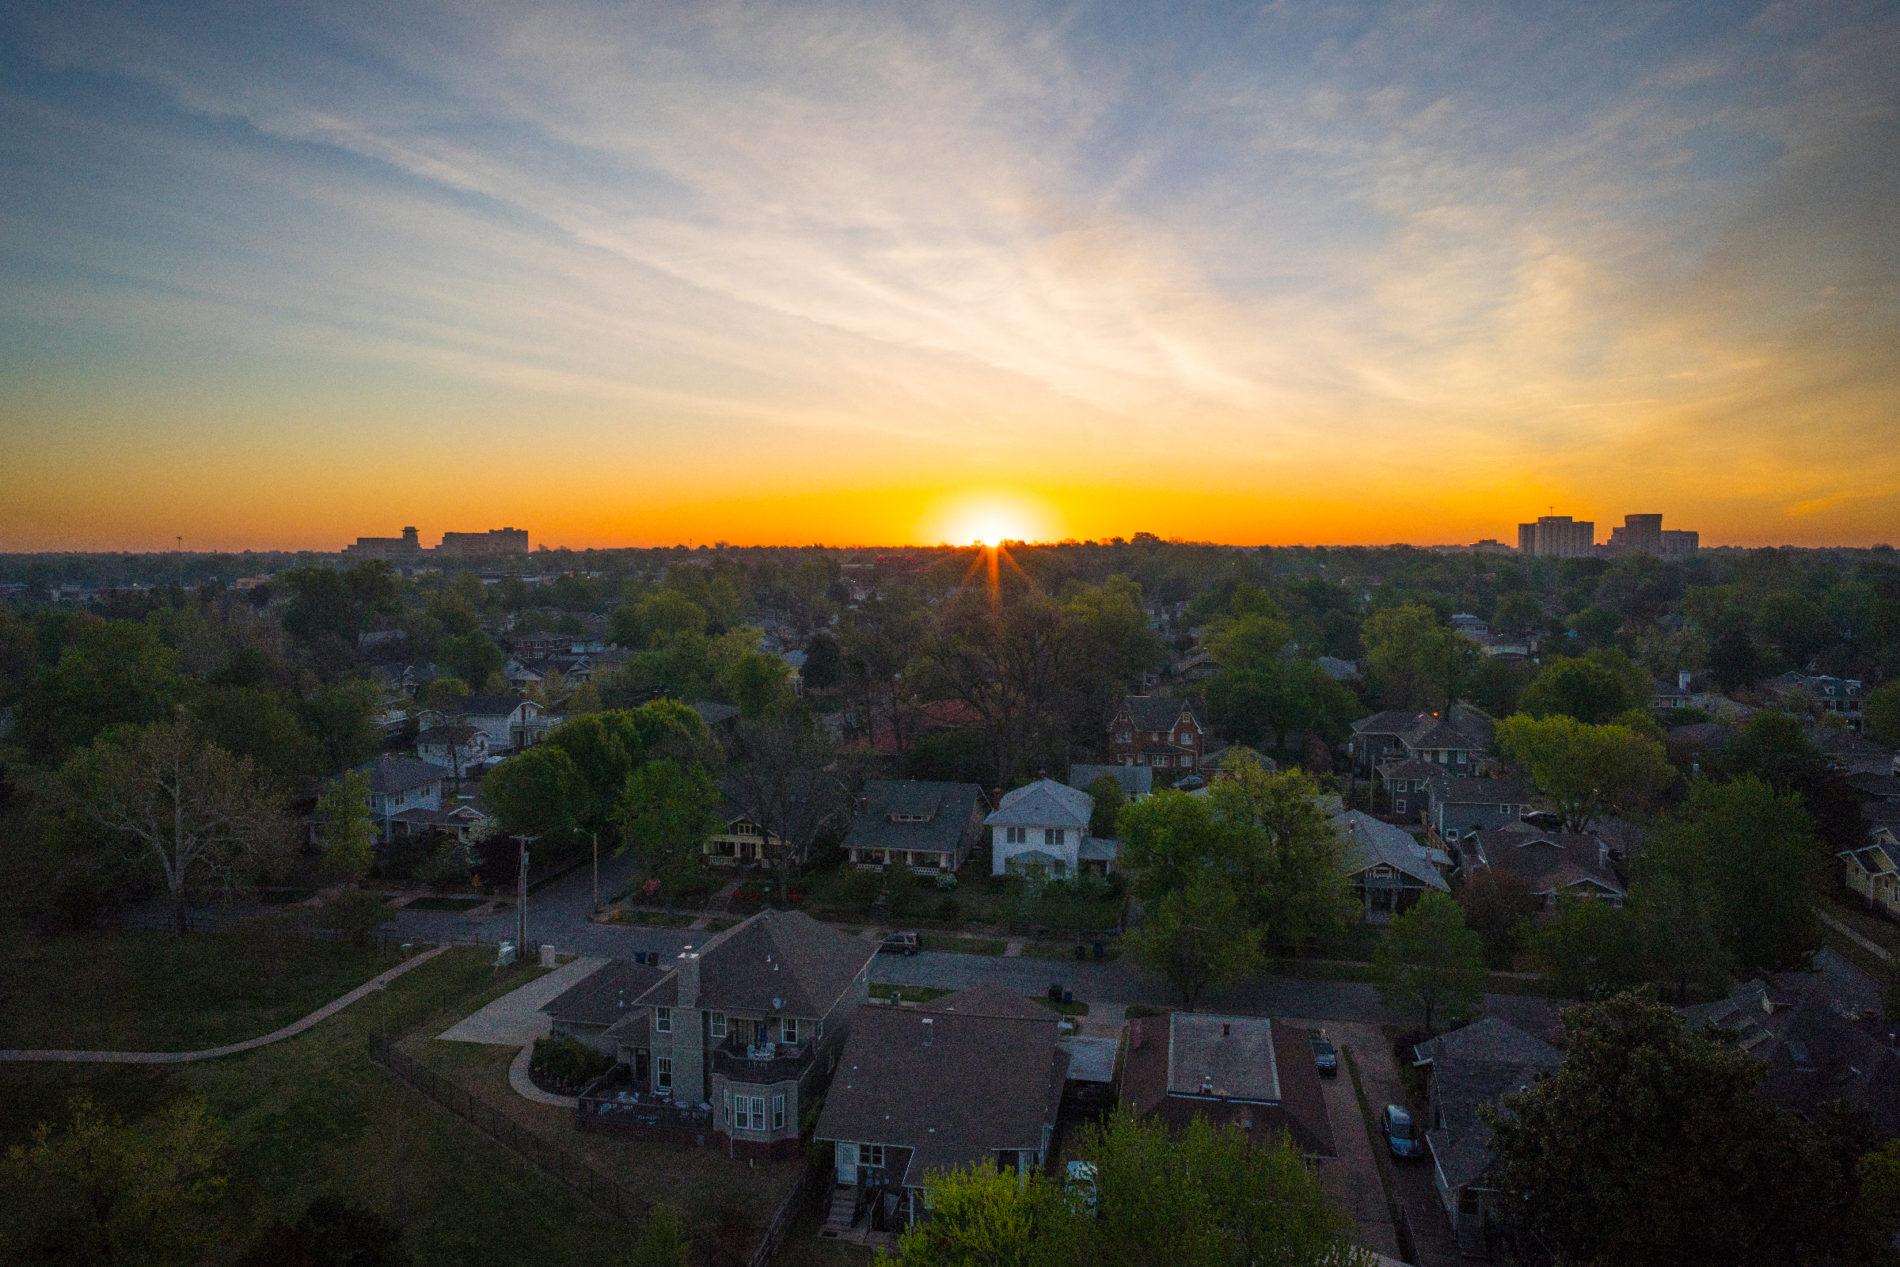 Sunrise in Tulsa Oklahoma